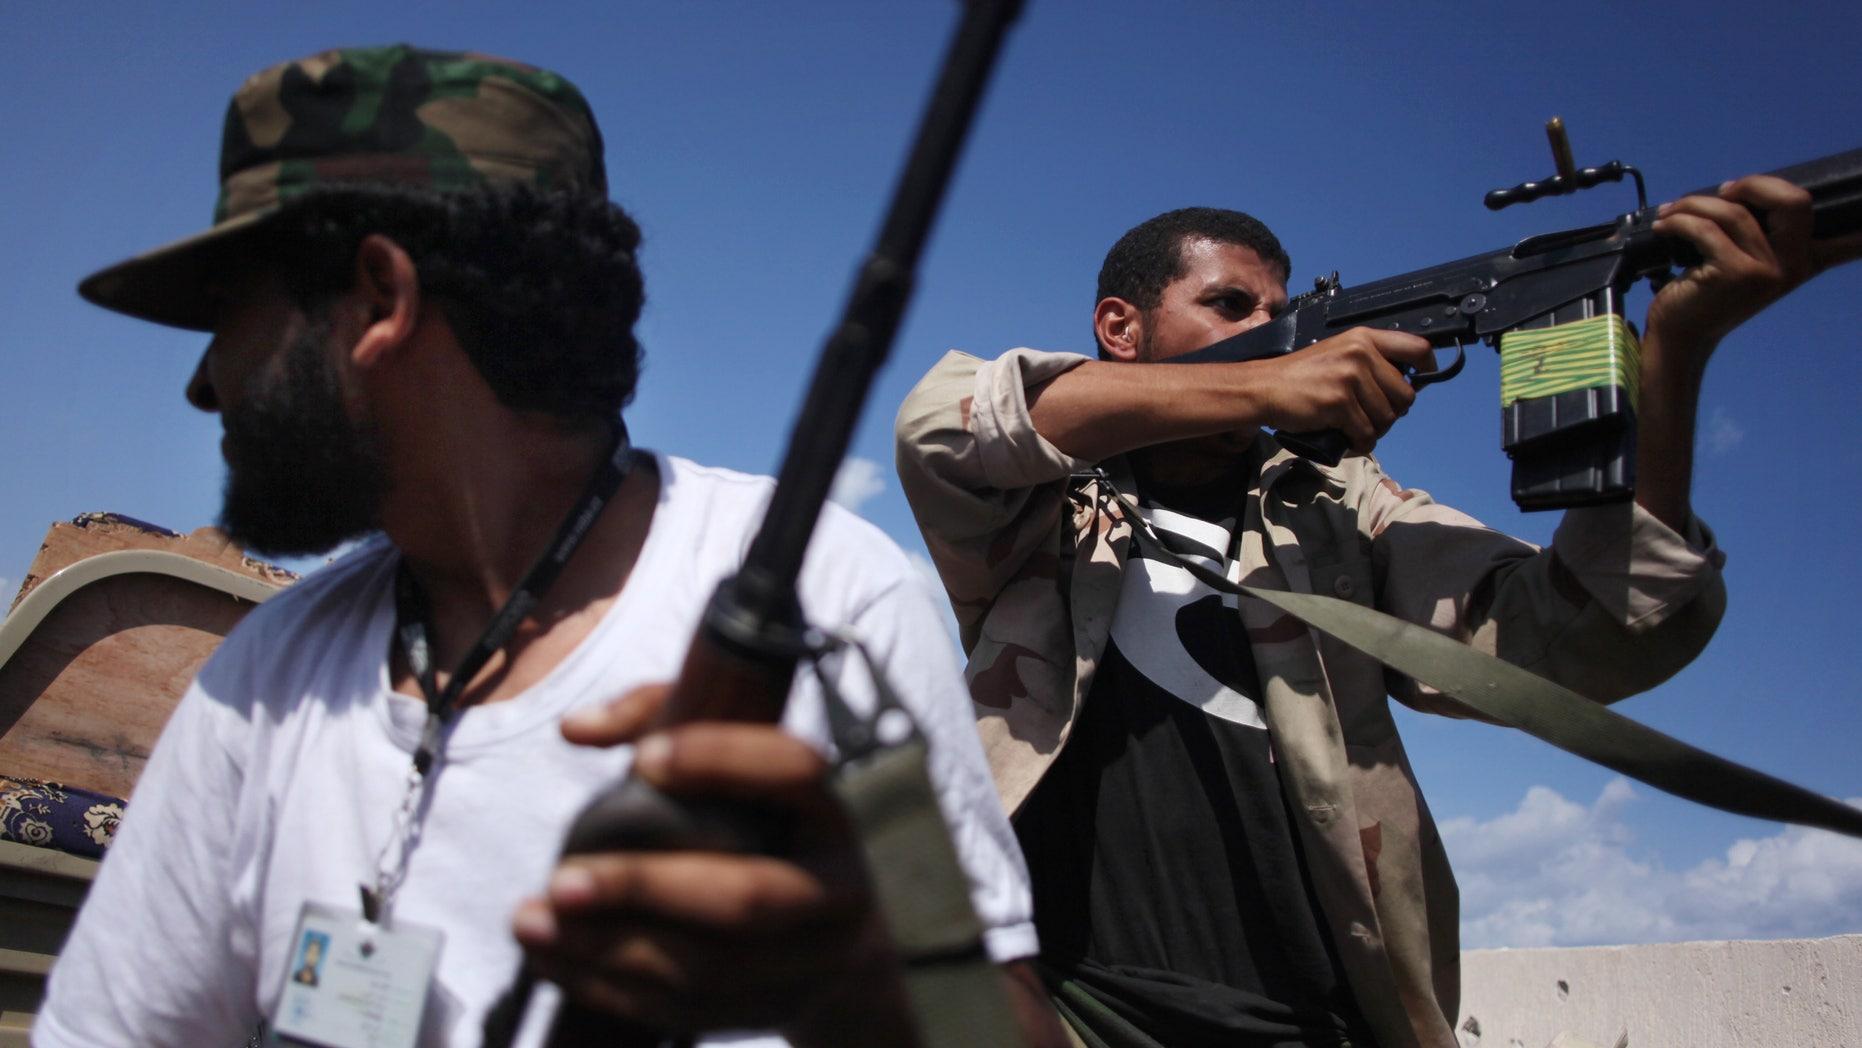 Oct. 18, 201:  Revolutionary fighters fire at Qaddafi loyalists in downtown Sirte, Libya.